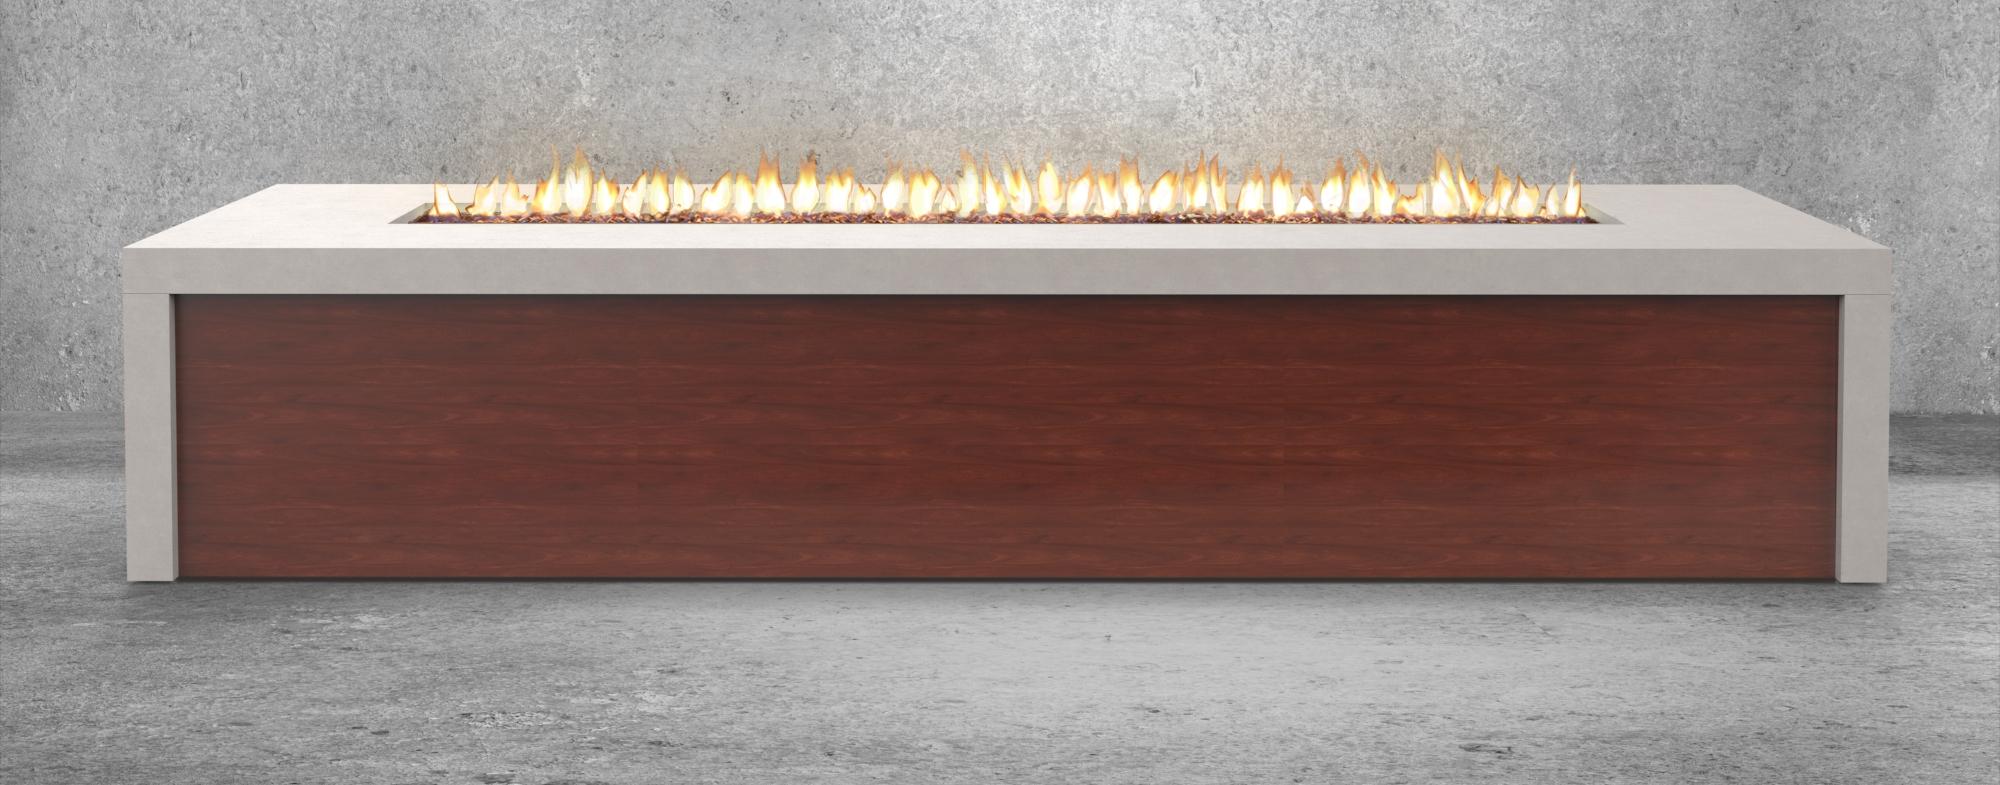 Fire feature concept narrow band-2.jpg